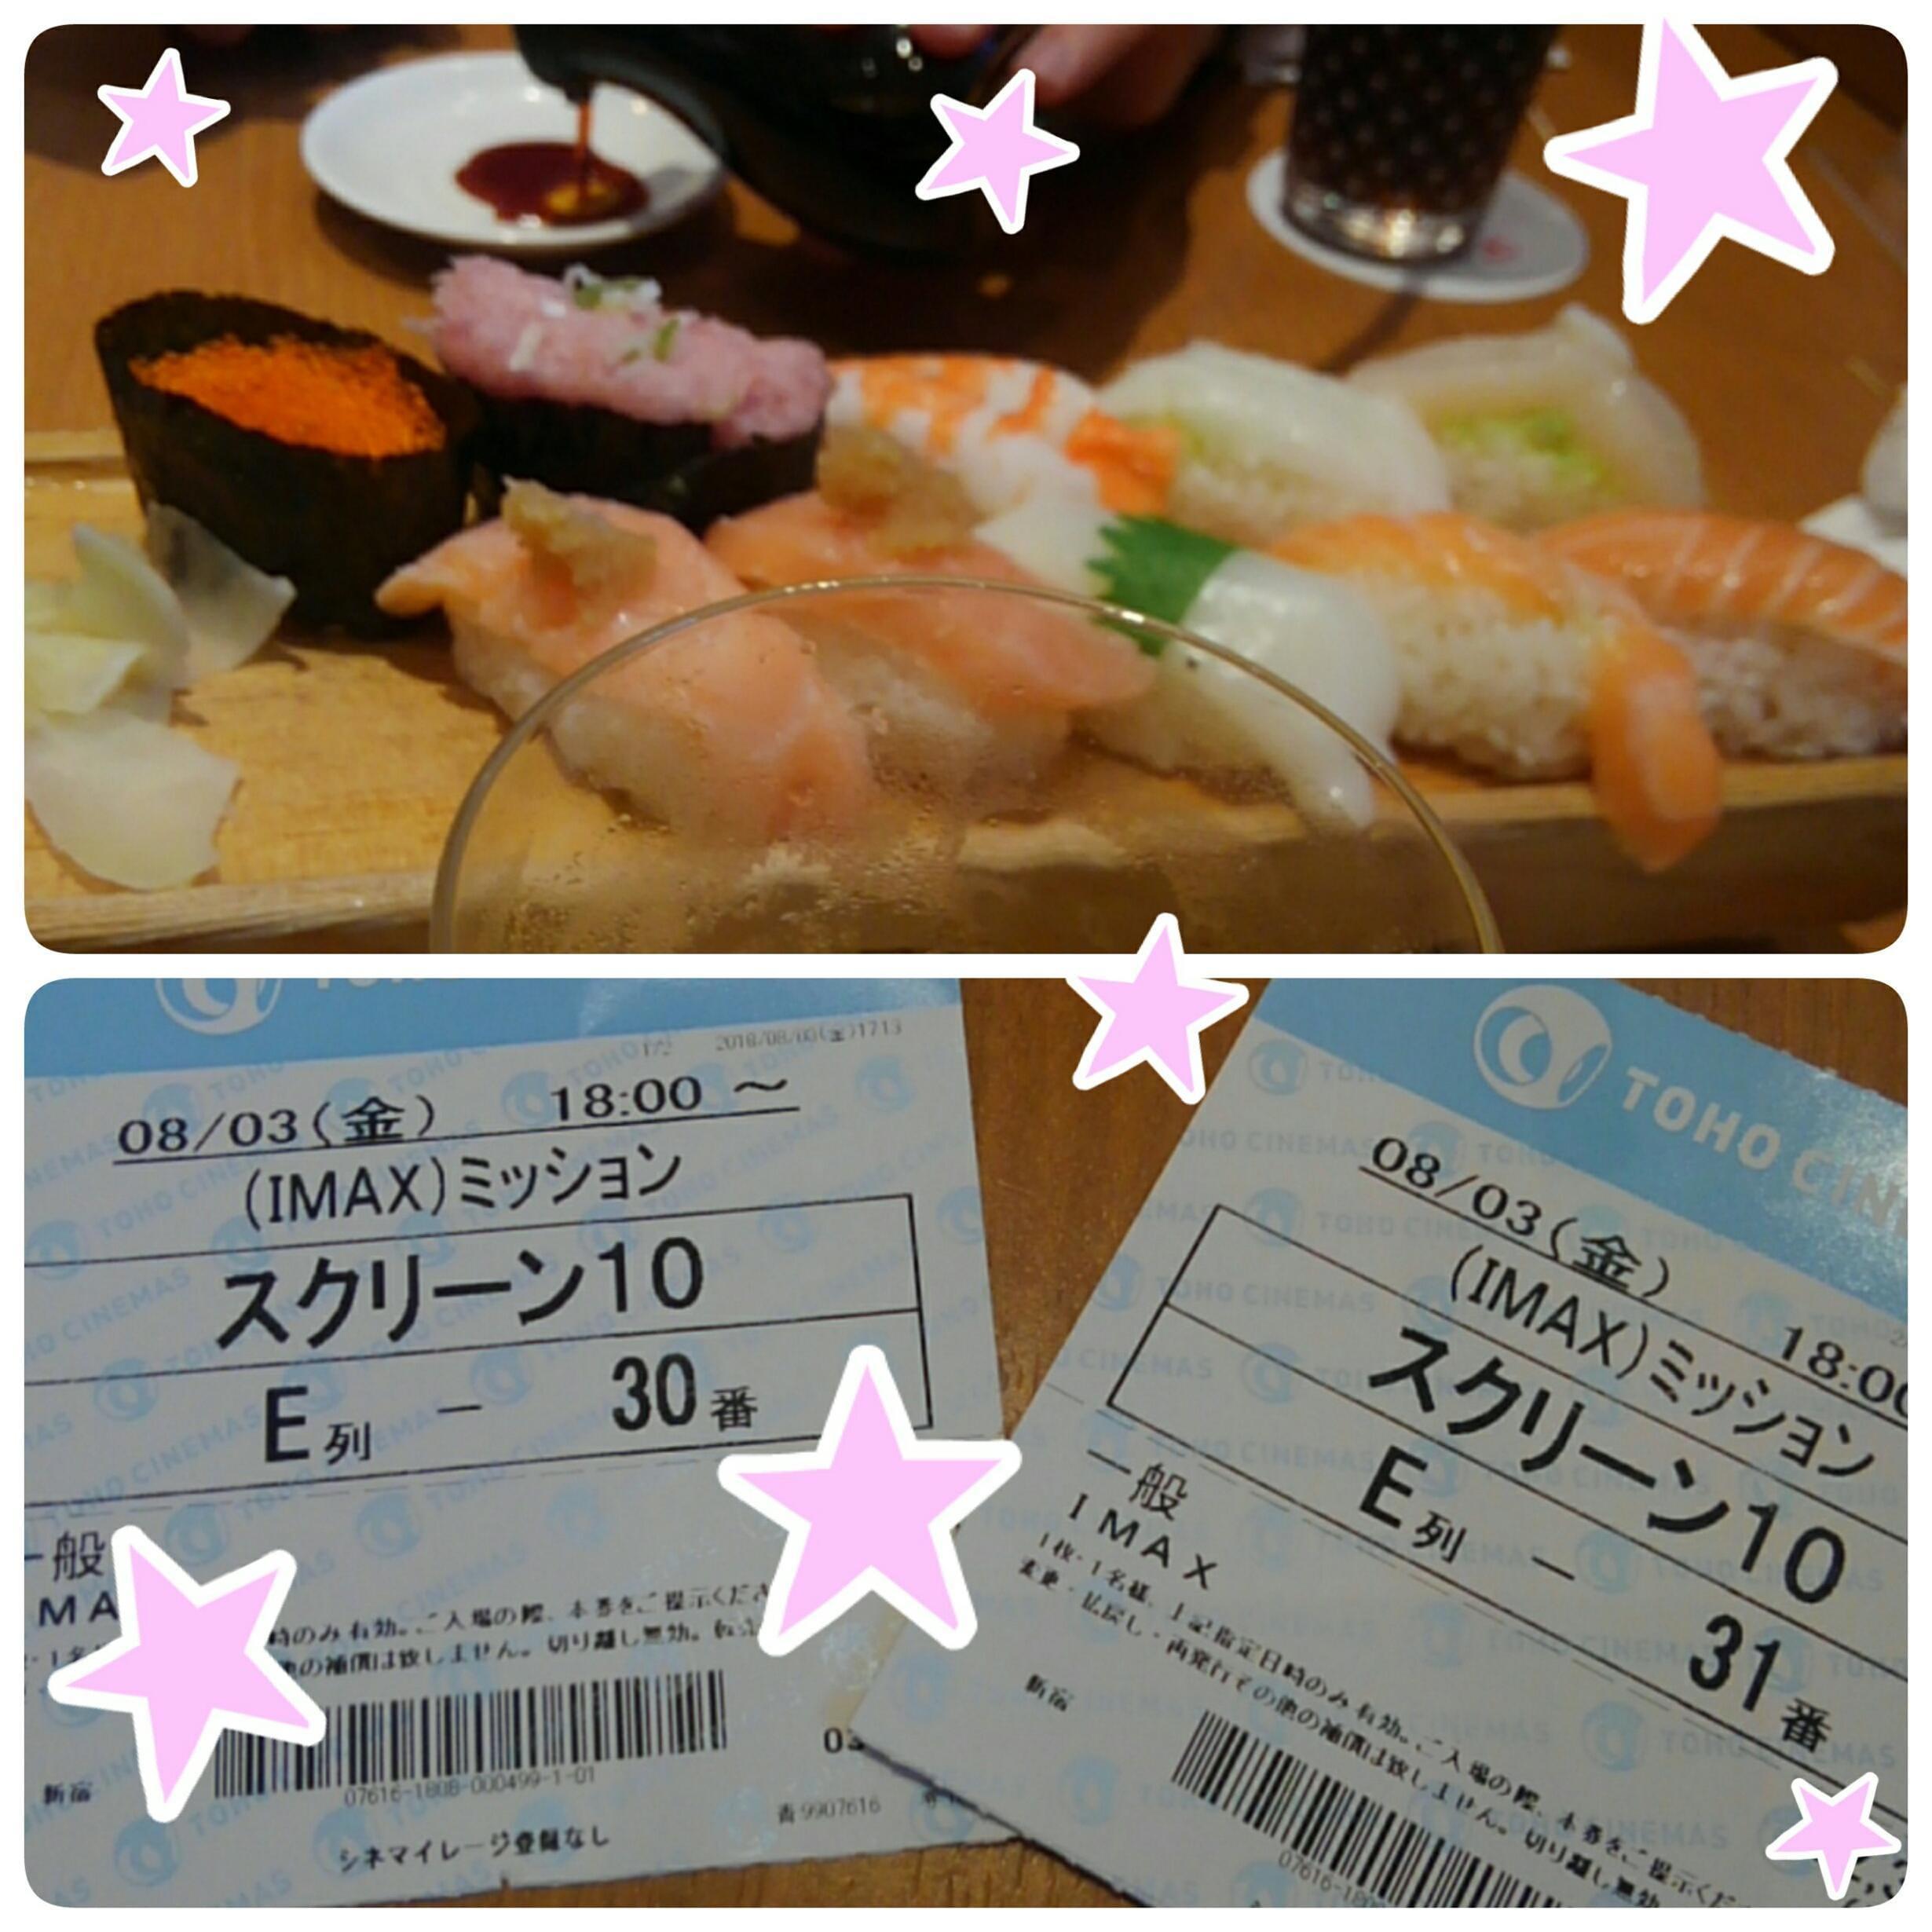 ◆21:00〜